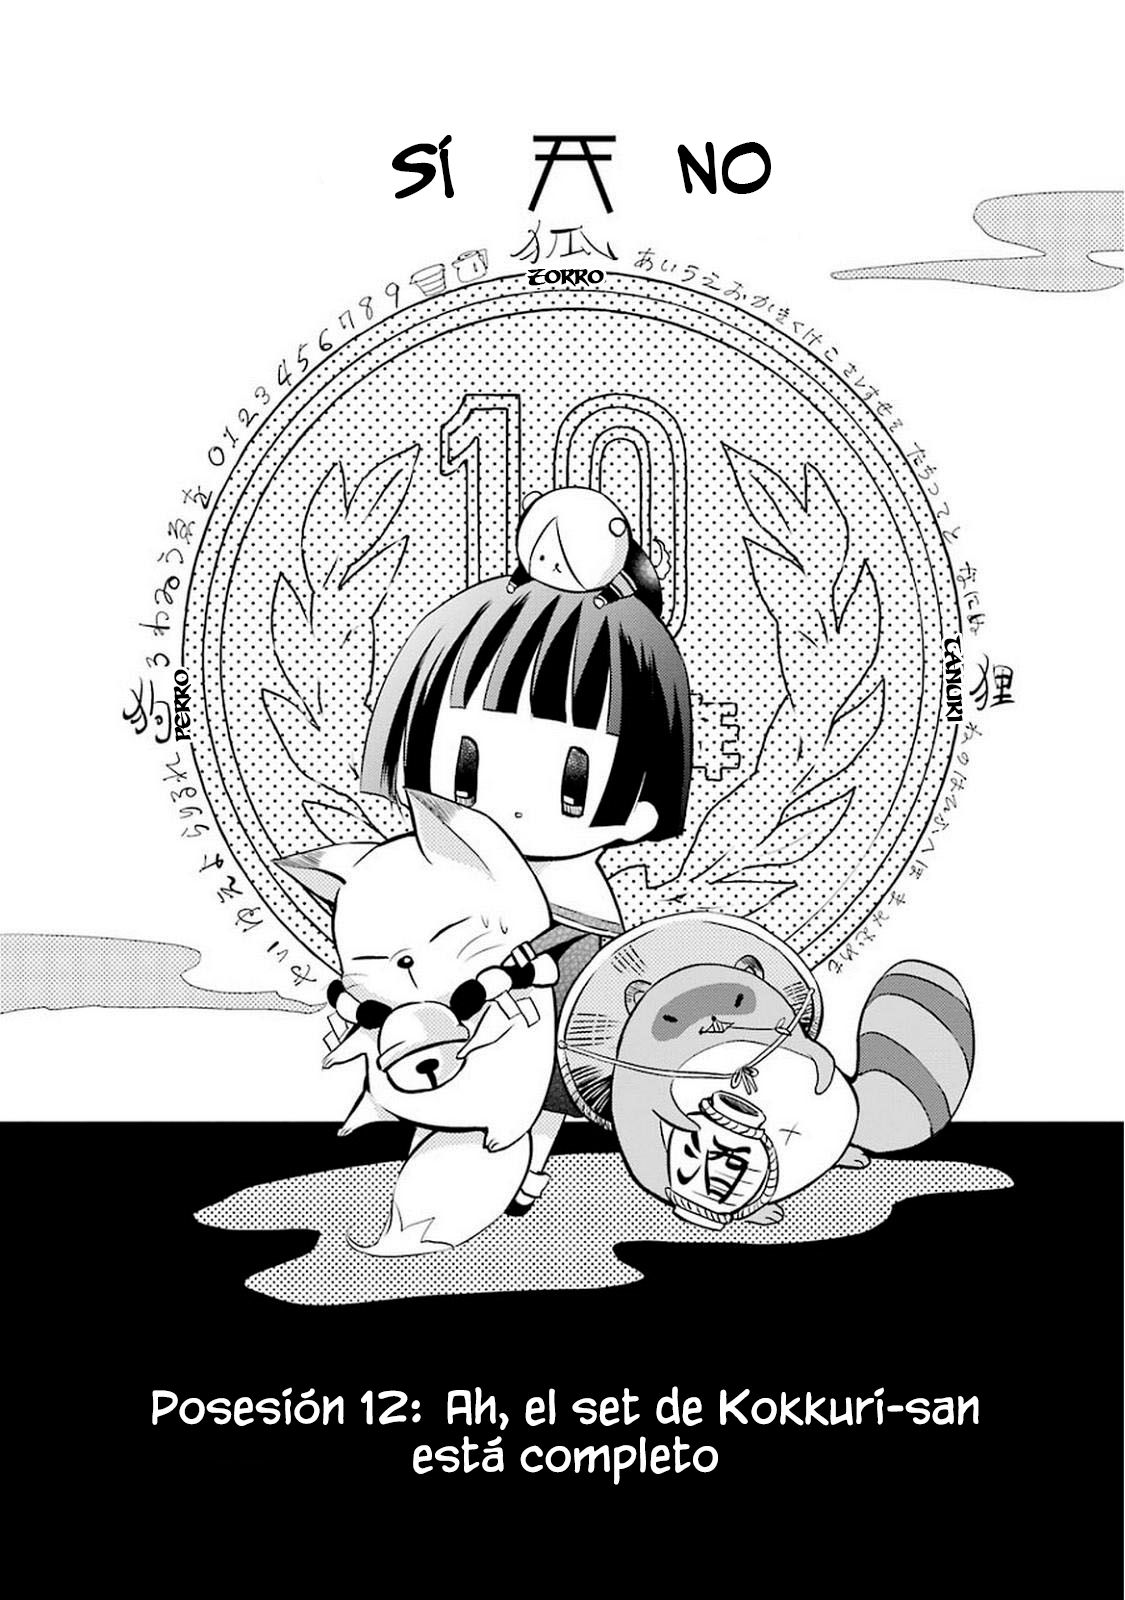 https://c5.ninemanga.com/es_manga/11/2187/485888/1517f0a6833787ddd960a4ffc6ed3ab4.jpg Page 2